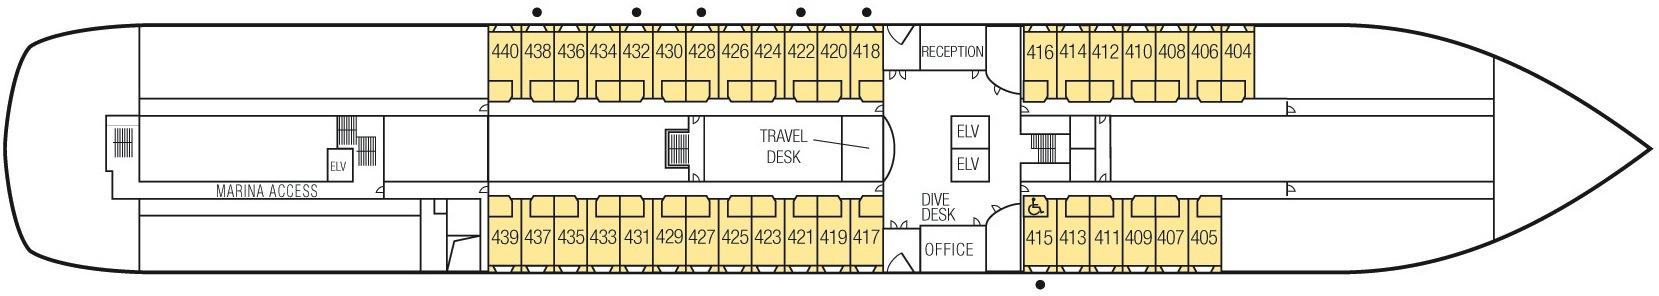 Paul Gauguin MS Paul Gauguin Deck Plans Deck 4.jpg